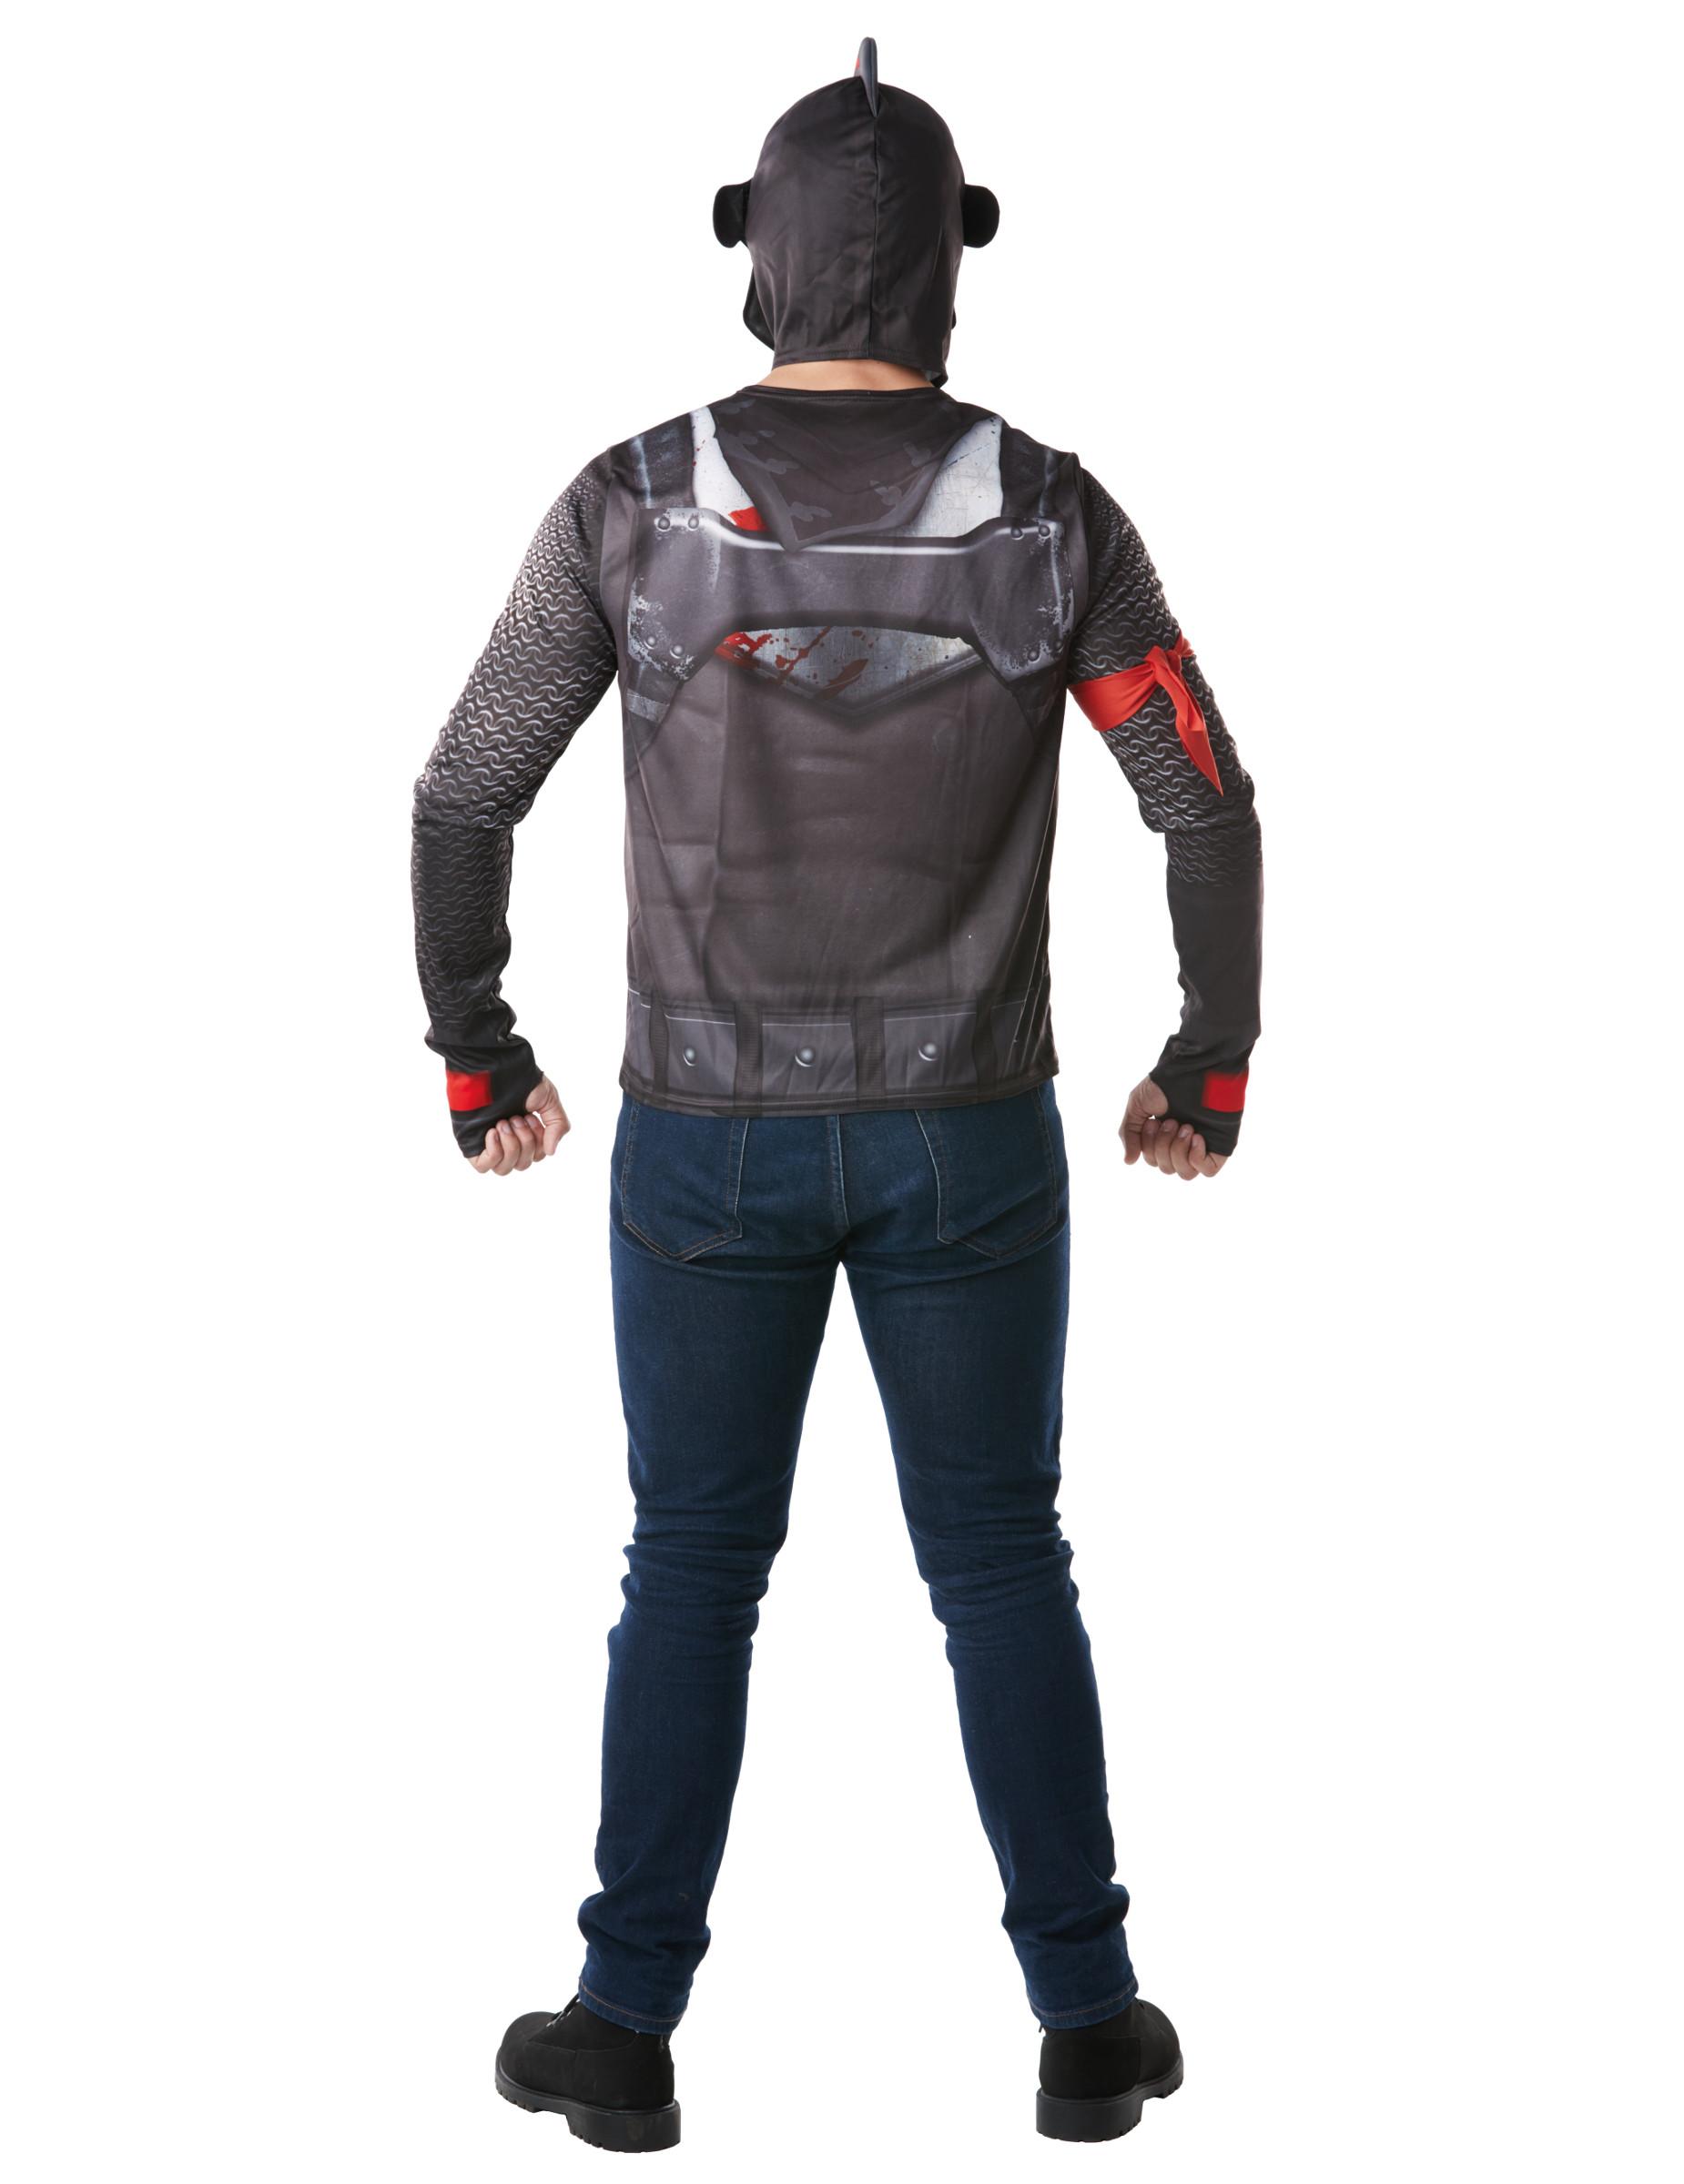 t shirt et casque black knight fortnite adulte 1 - fortnite anniversaire deco